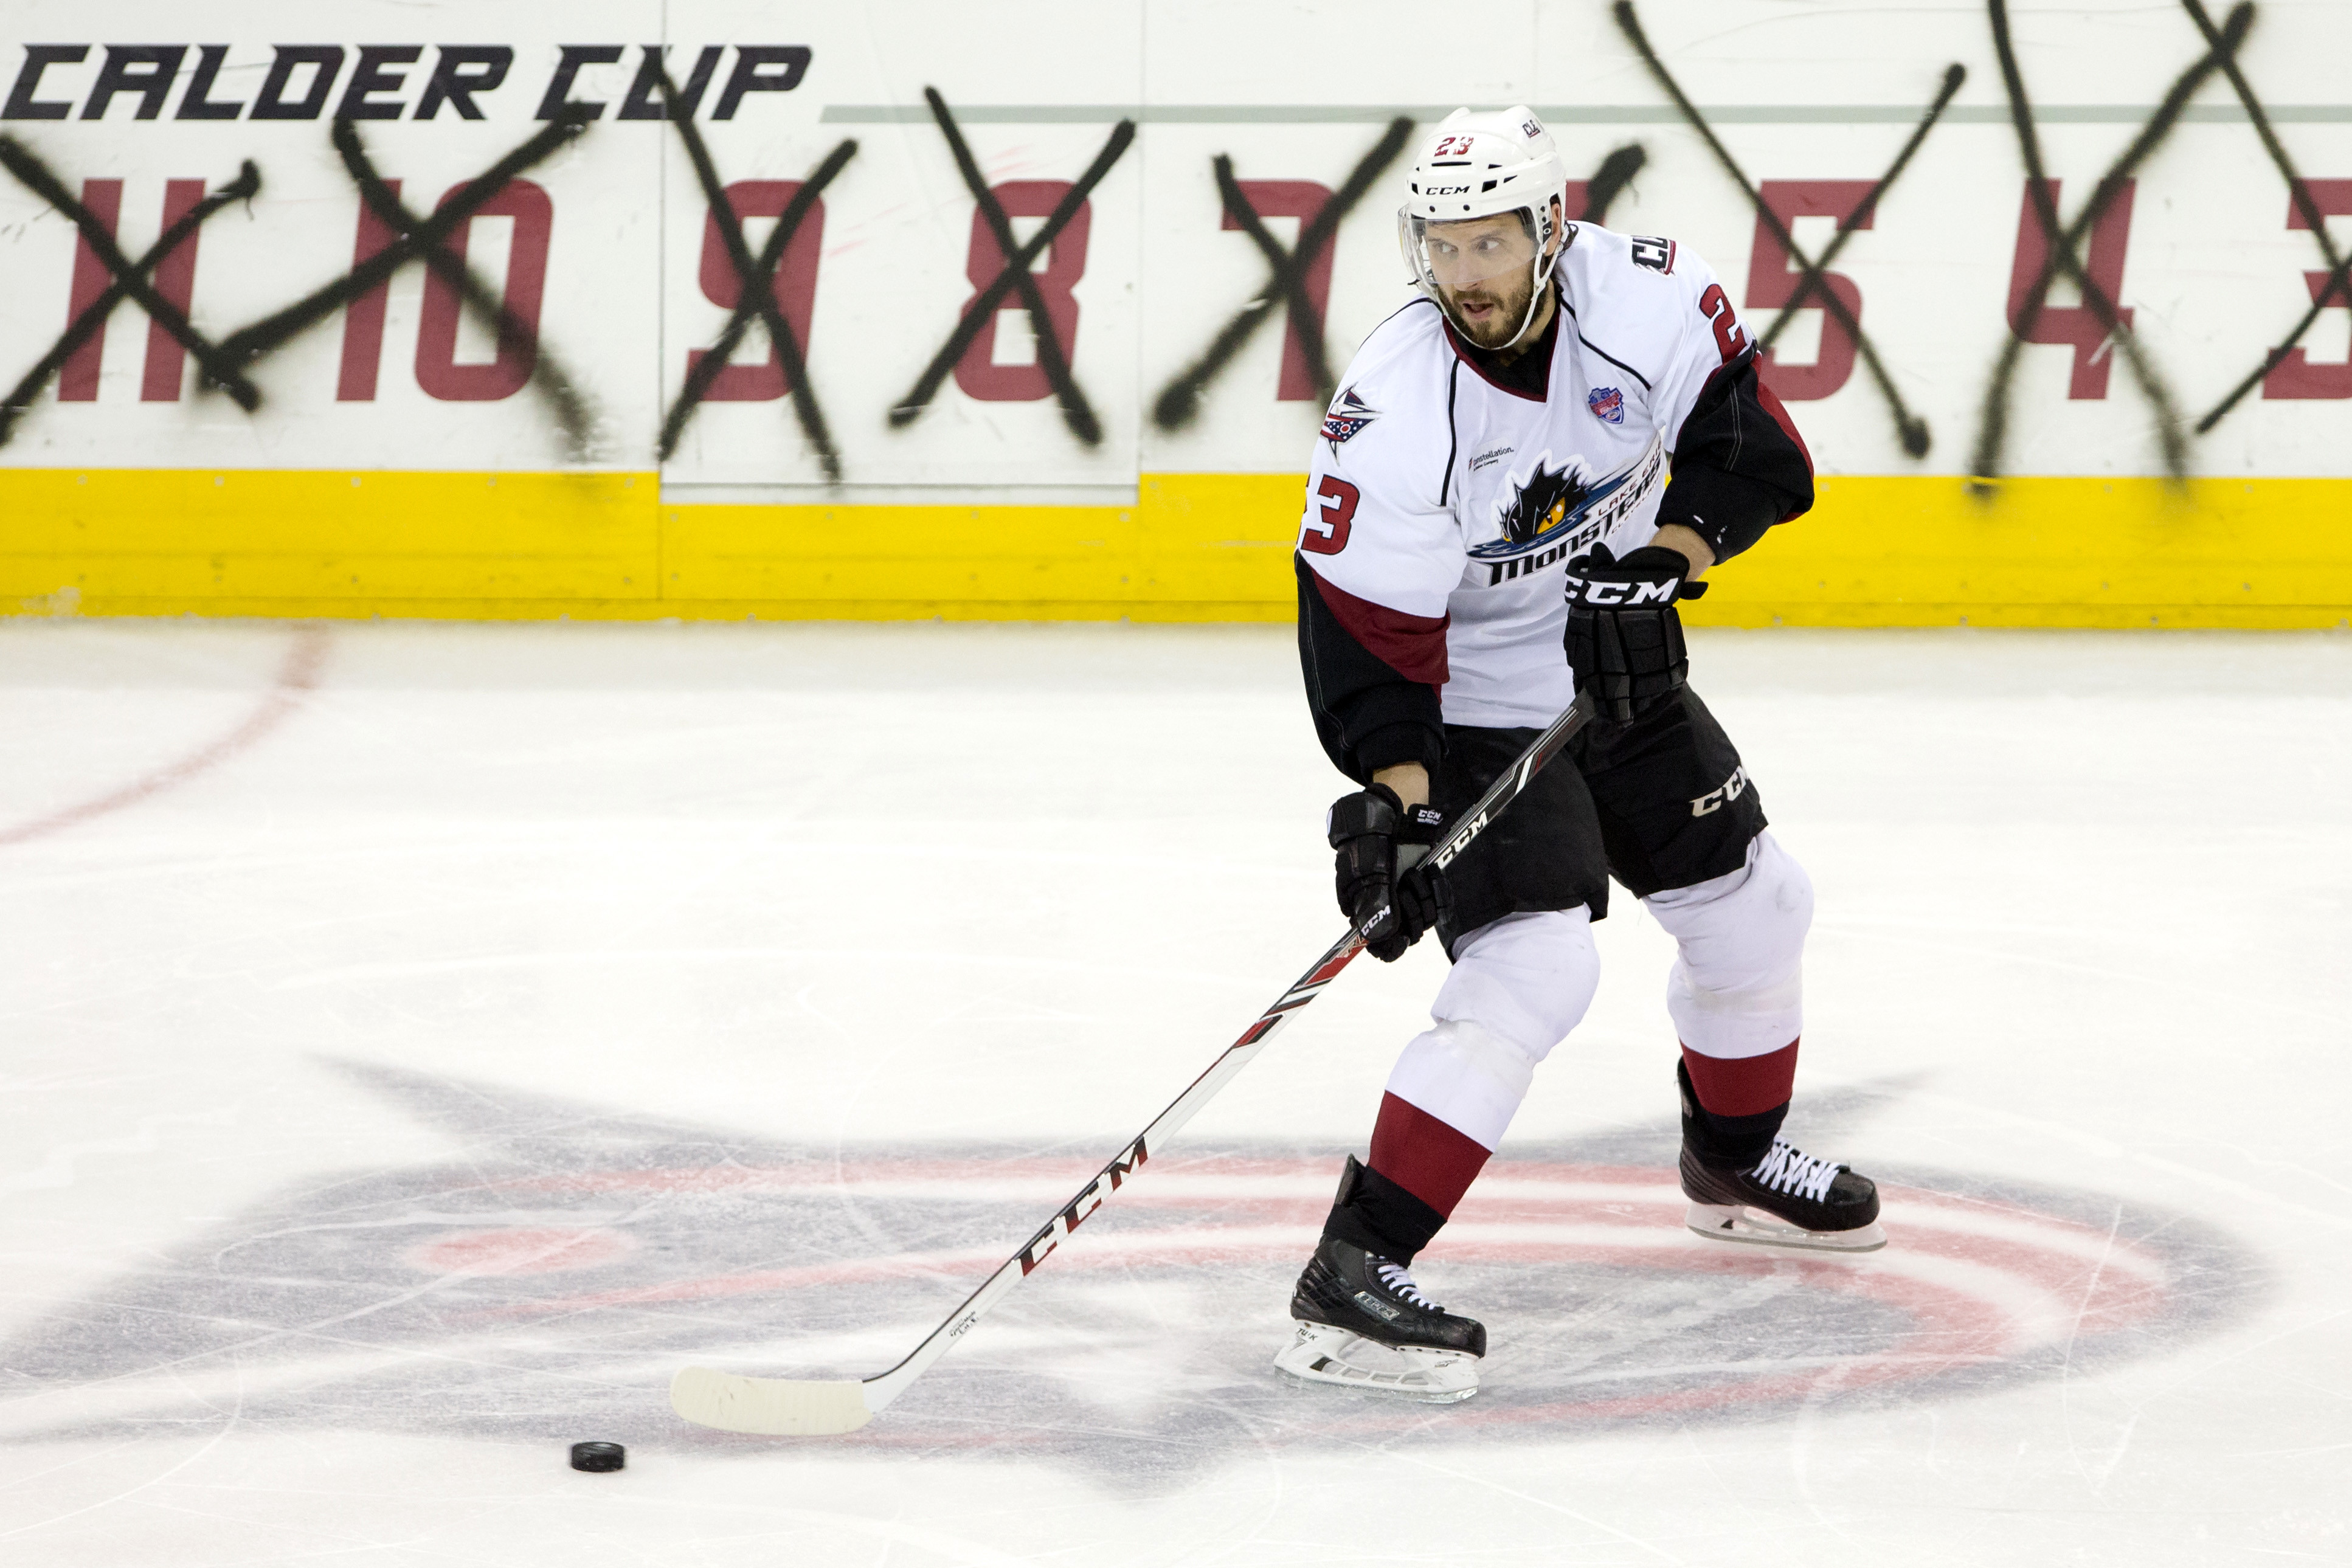 AHL: JUN 06 Calder Cup Finals - Game 3 - Hershey Bears at Lake Erie Monsters